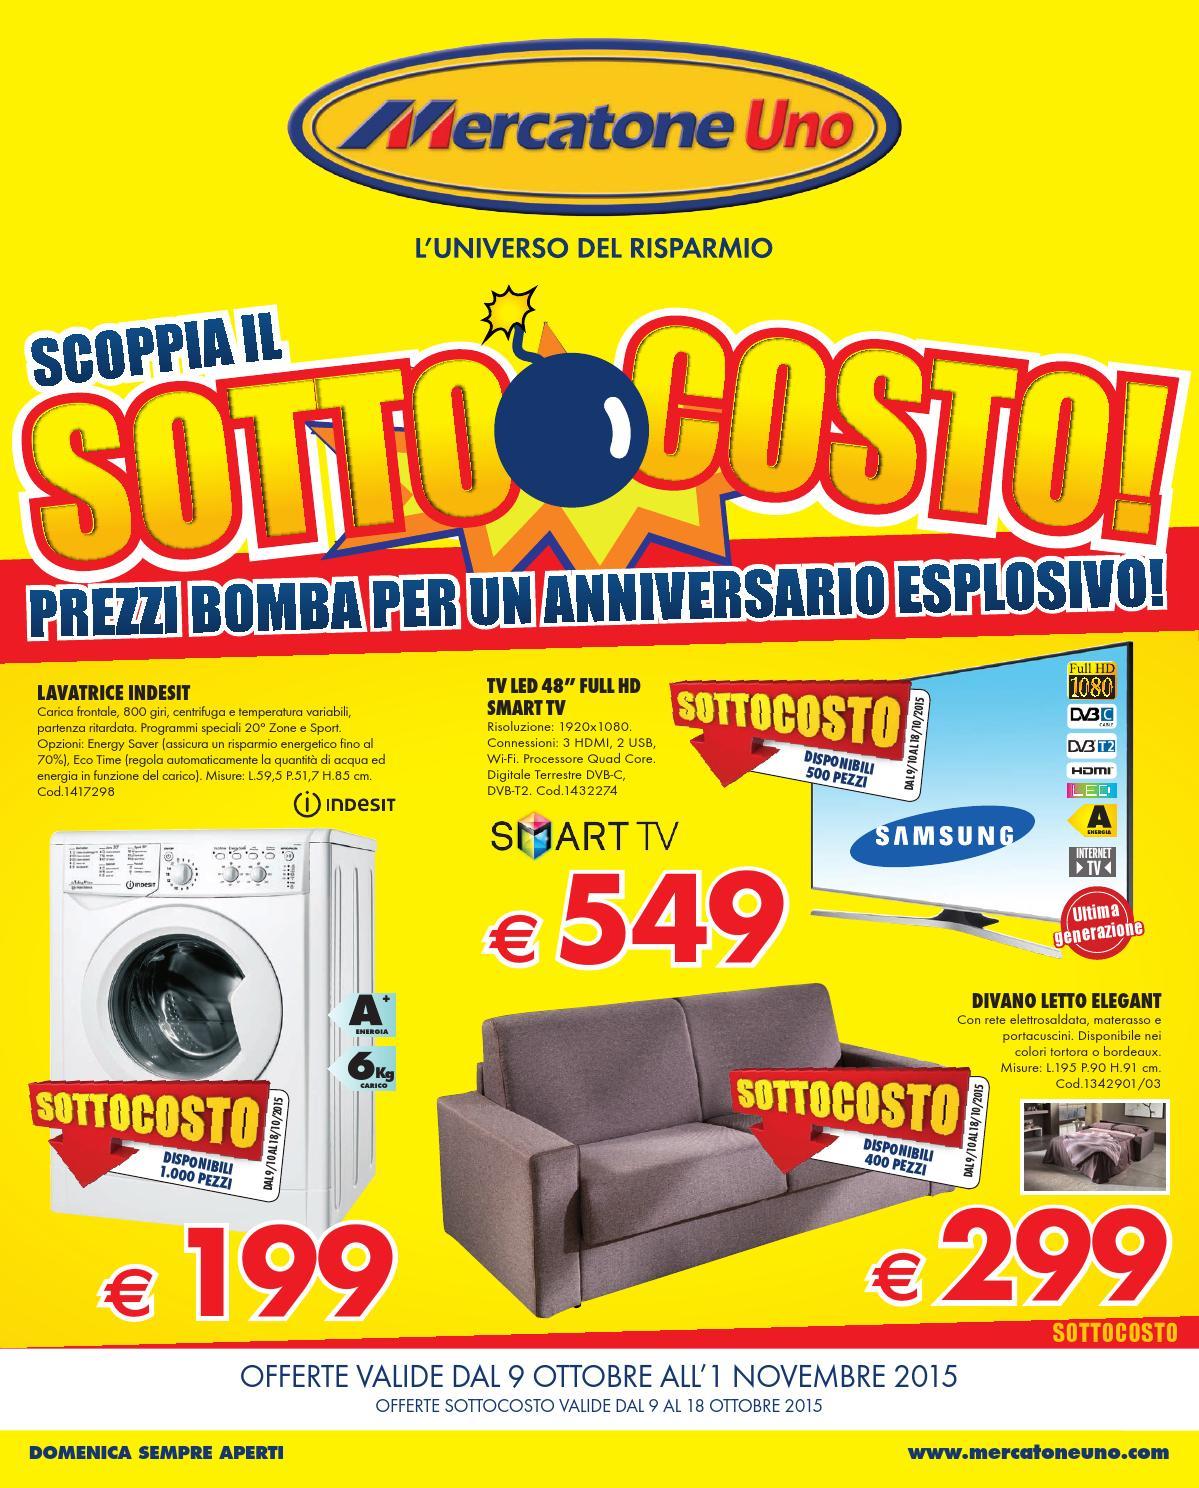 Mercatoneuno catalogo 9ottobre 1novembre2015 by for Emmelunga catalogo